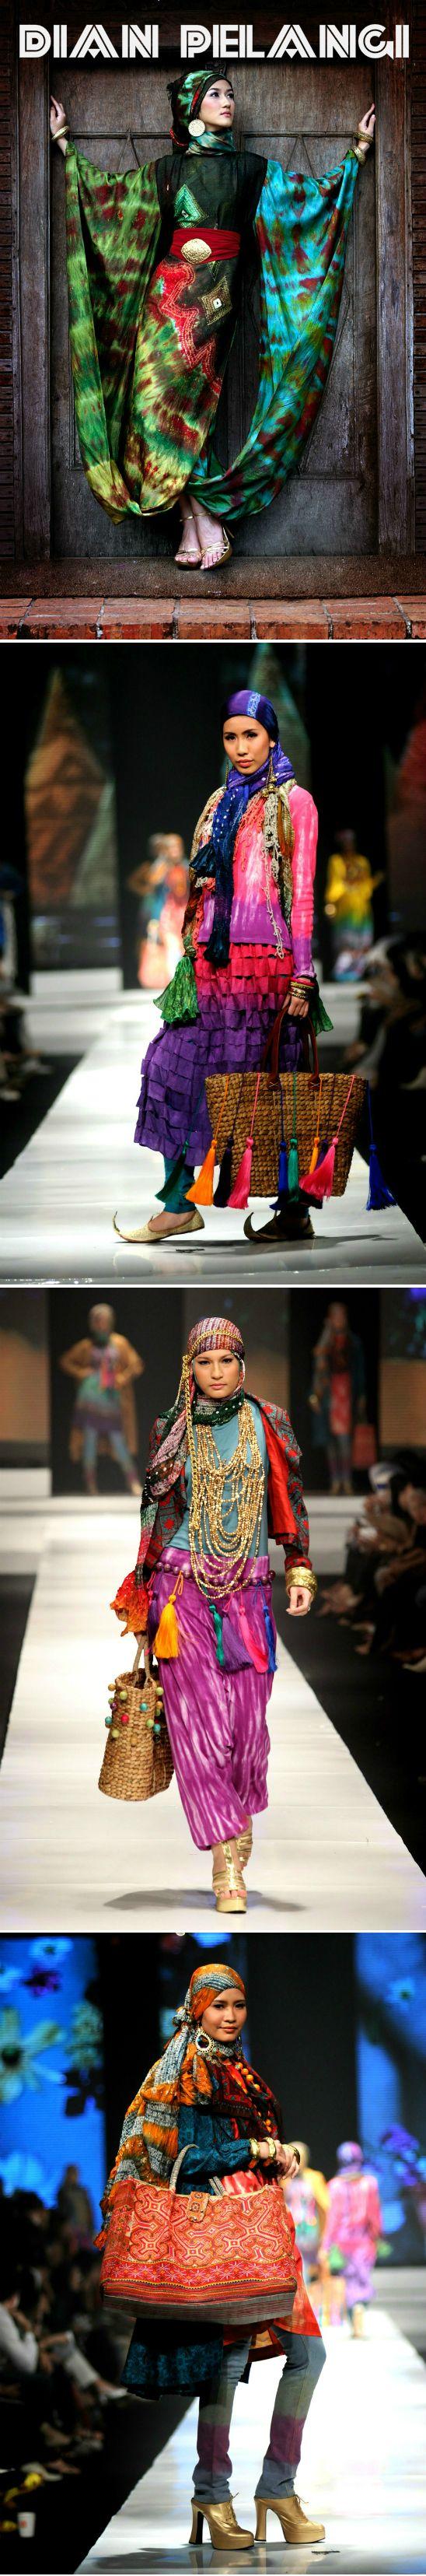 Fashion Crush of the Day: Dian Pelangi {Indonesia}